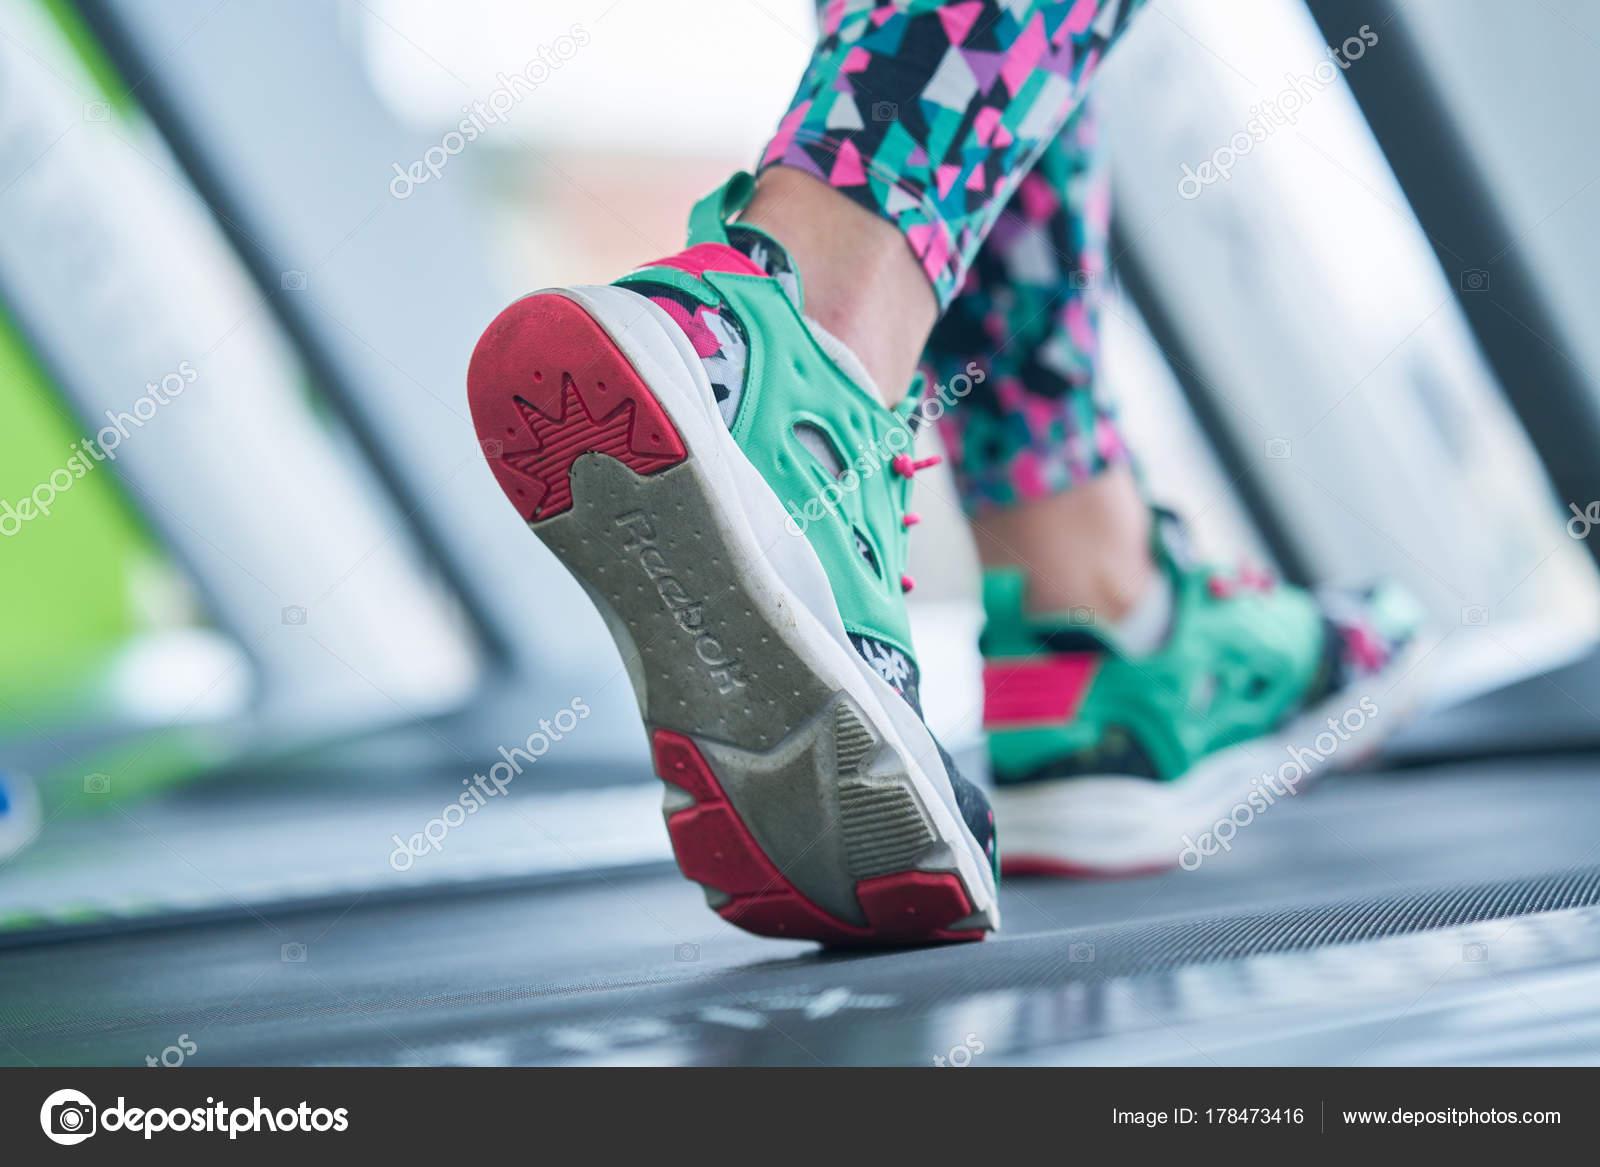 Female Muscular Feet Sneakers Running Treadmill Gym Stock Photo